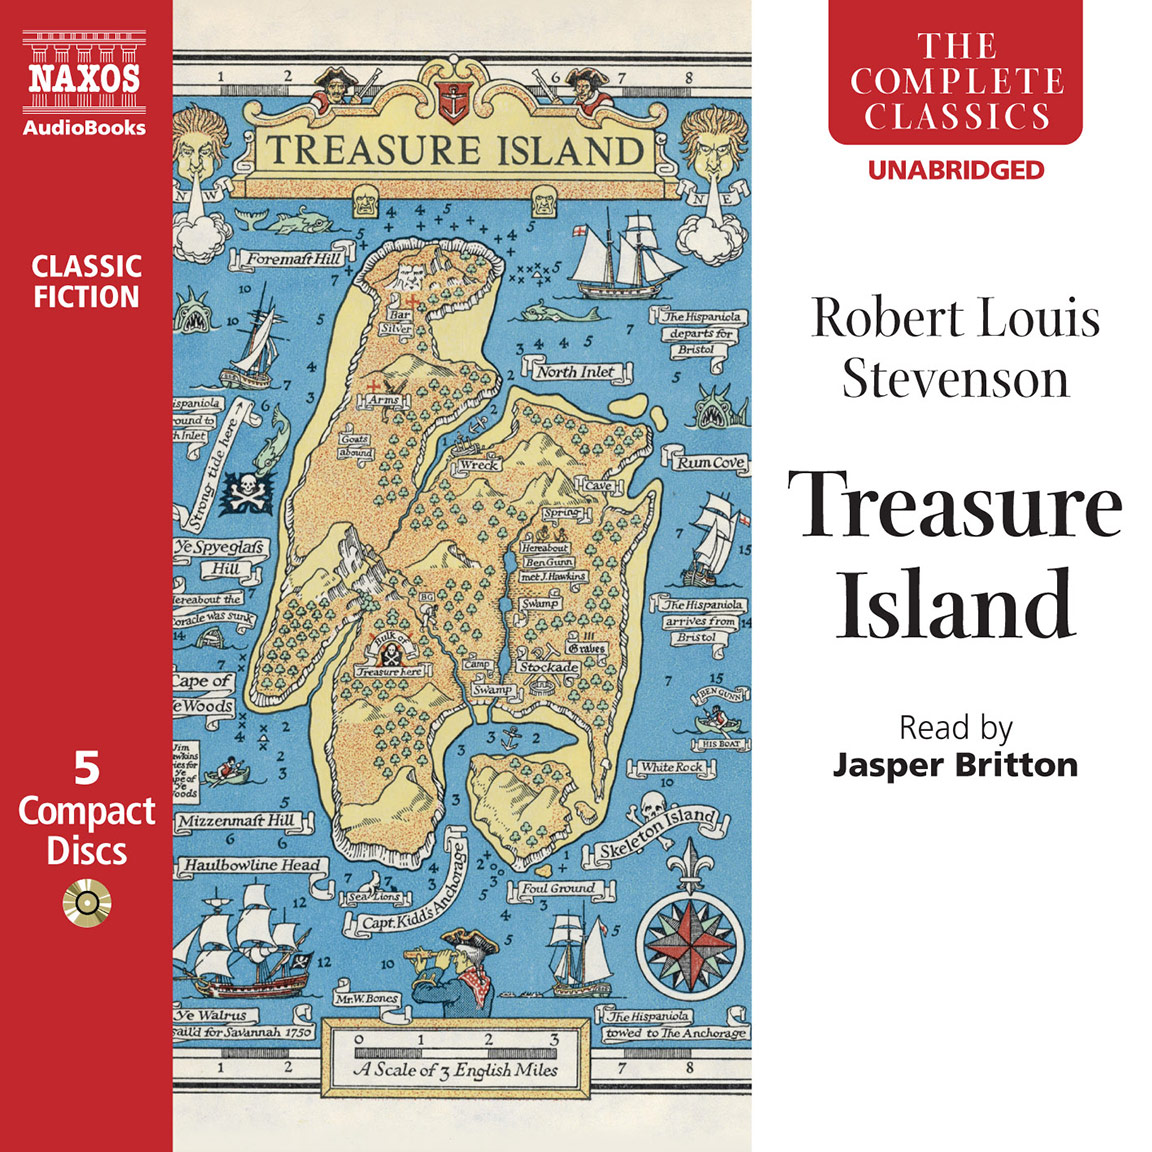 The audiobook cover of Treasure Island